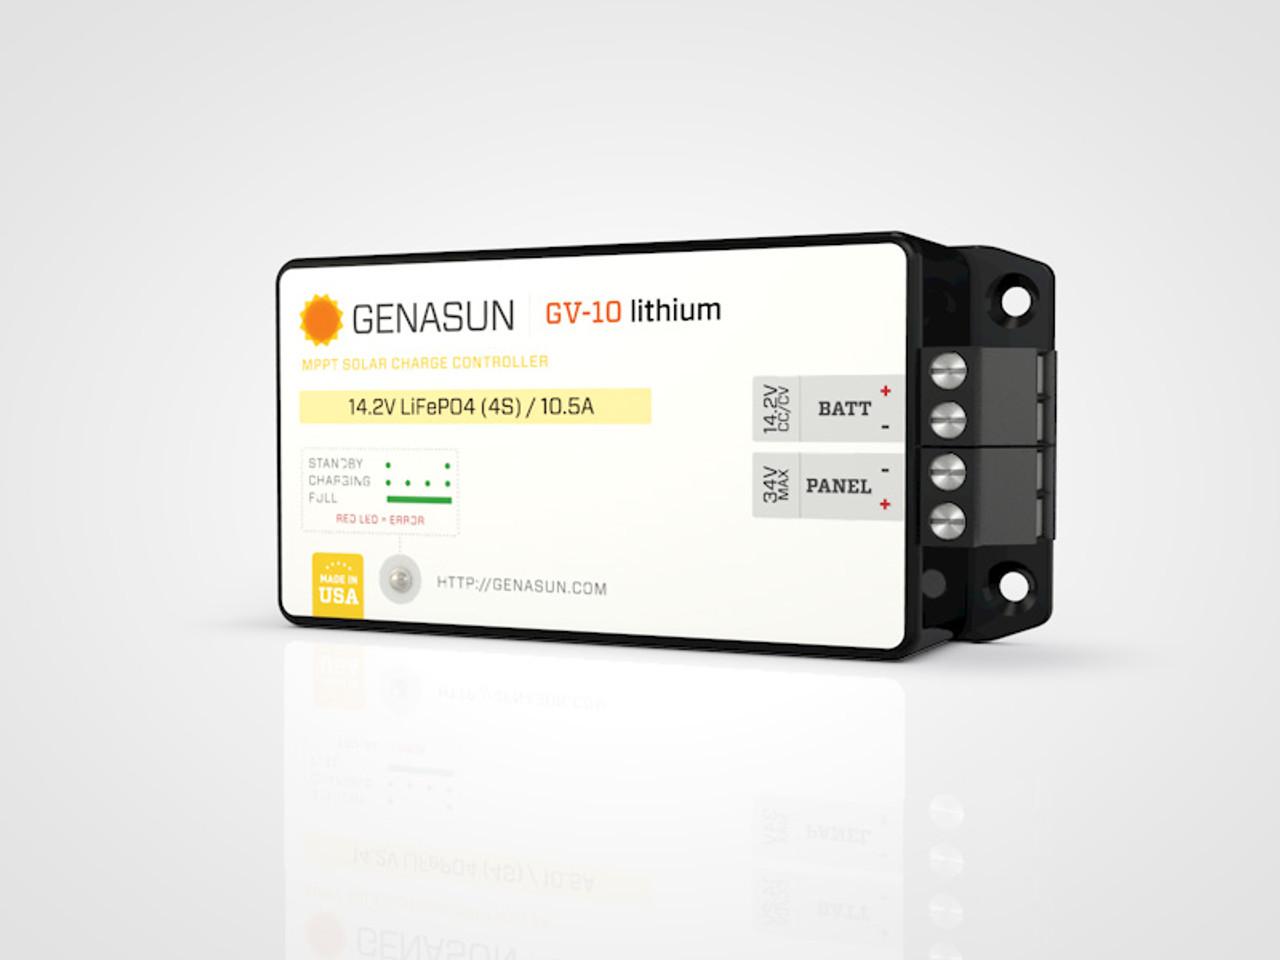 GV-10 | 140W 10.5A Genasun MPPT Solar Charge Controller - Li - Right1